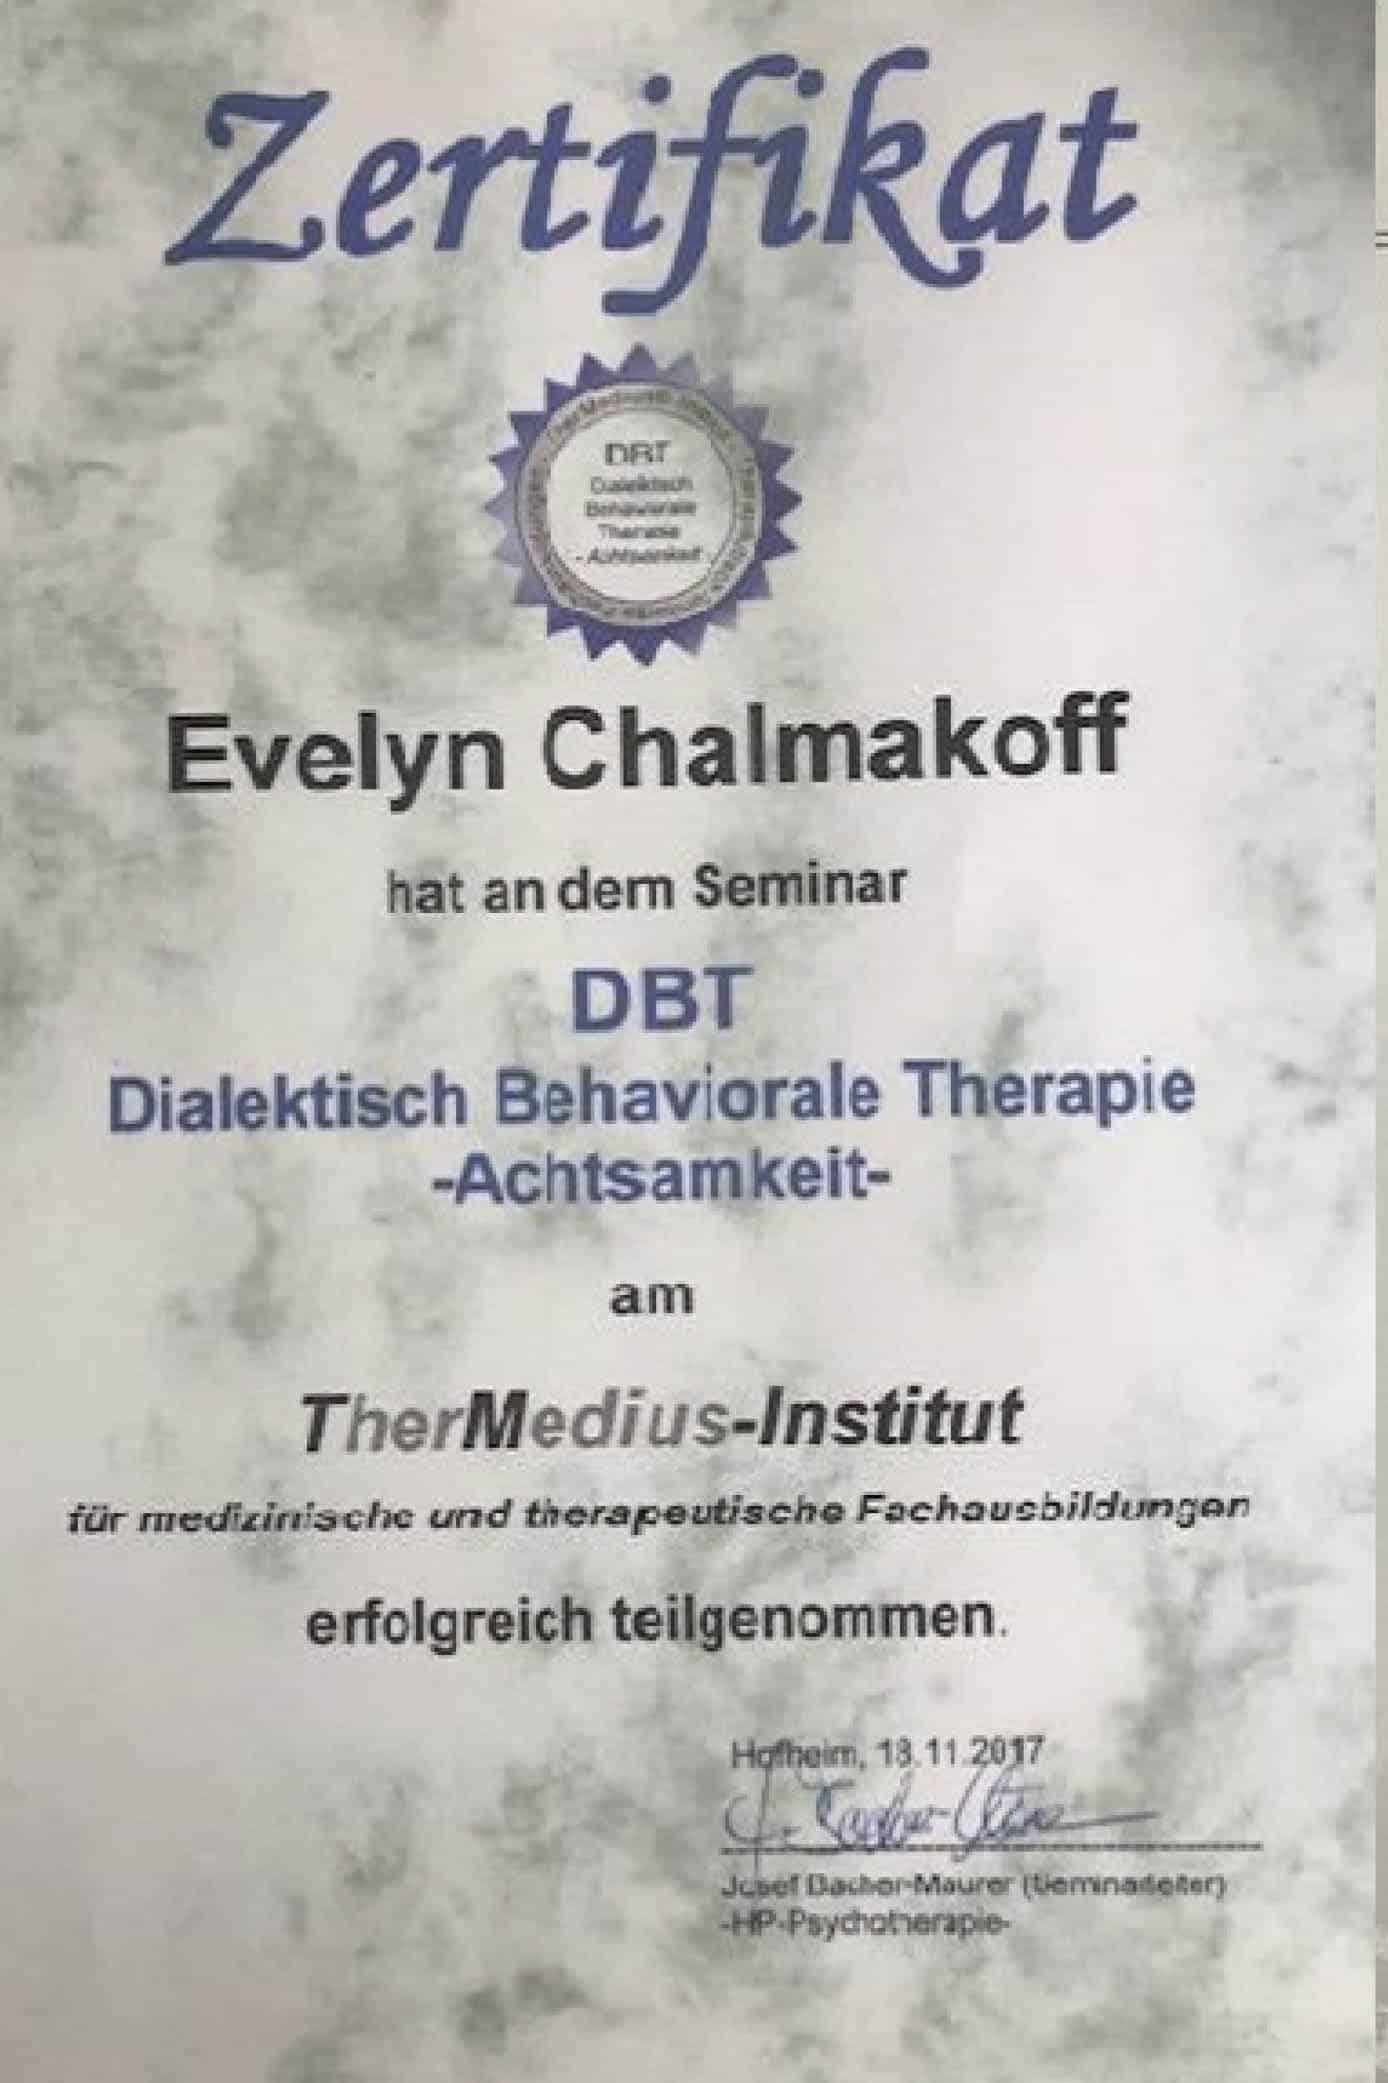 Fachfortbildung Achtsamkeit/DBT